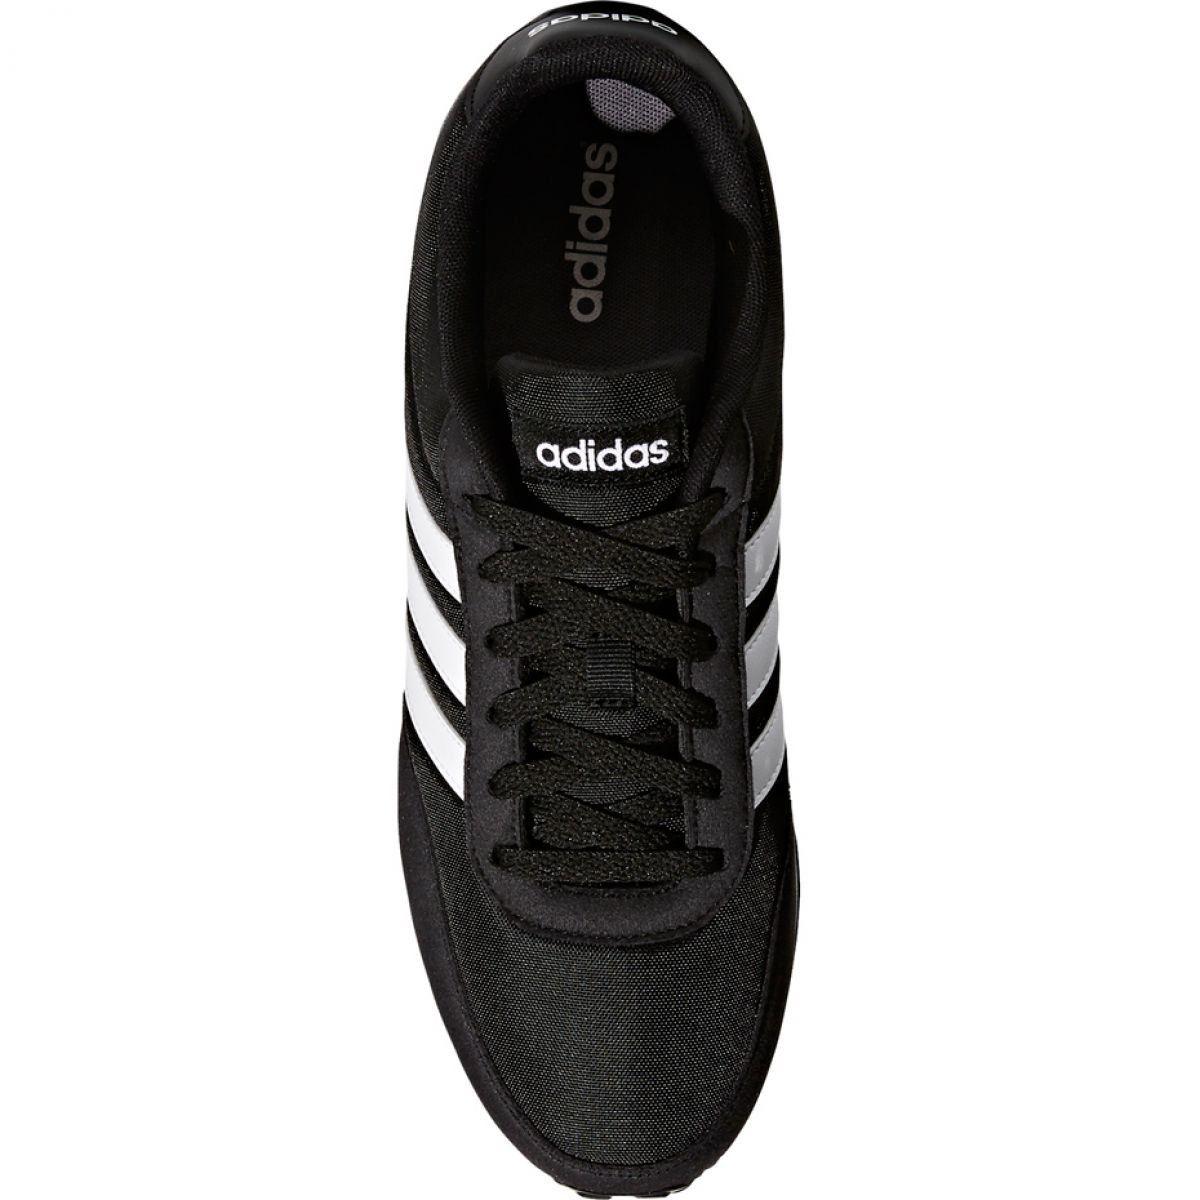 Adidas V Racer 2 0 M Bc0106 Shoes Black Sports Shoes Adidas Adidas Shoes